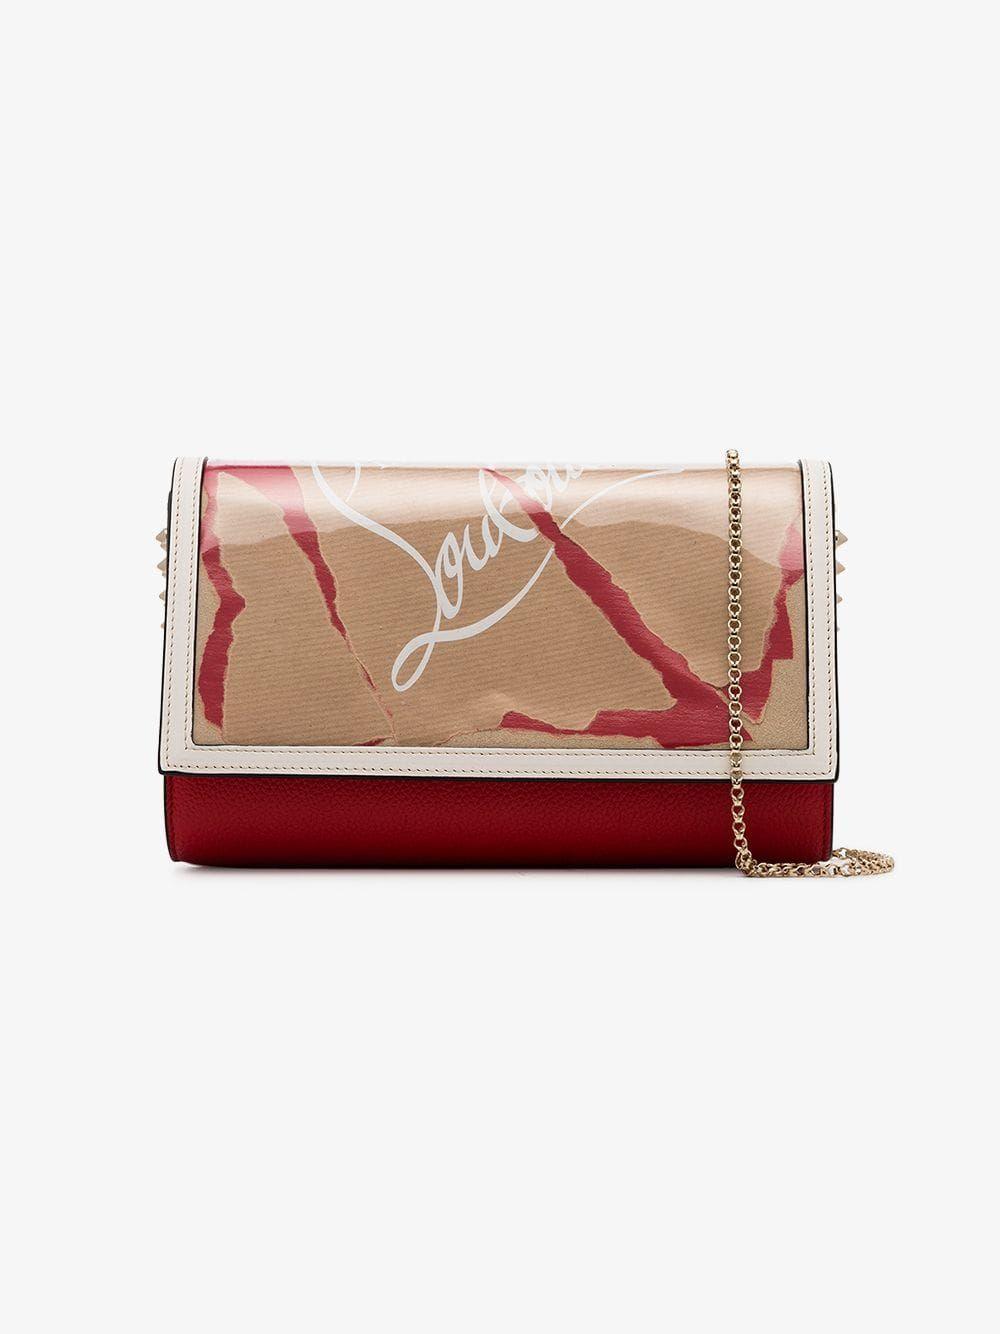 7b7ea6f283 CHRISTIAN LOUBOUTIN CHRISTIAN LOUBOUTIN BROWN, WHITE AND RED PALOMA STUDDED  LEATHER CLUTCH BAG. #christianlouboutin #bags #shoulder bags #clutch  #metallic ...